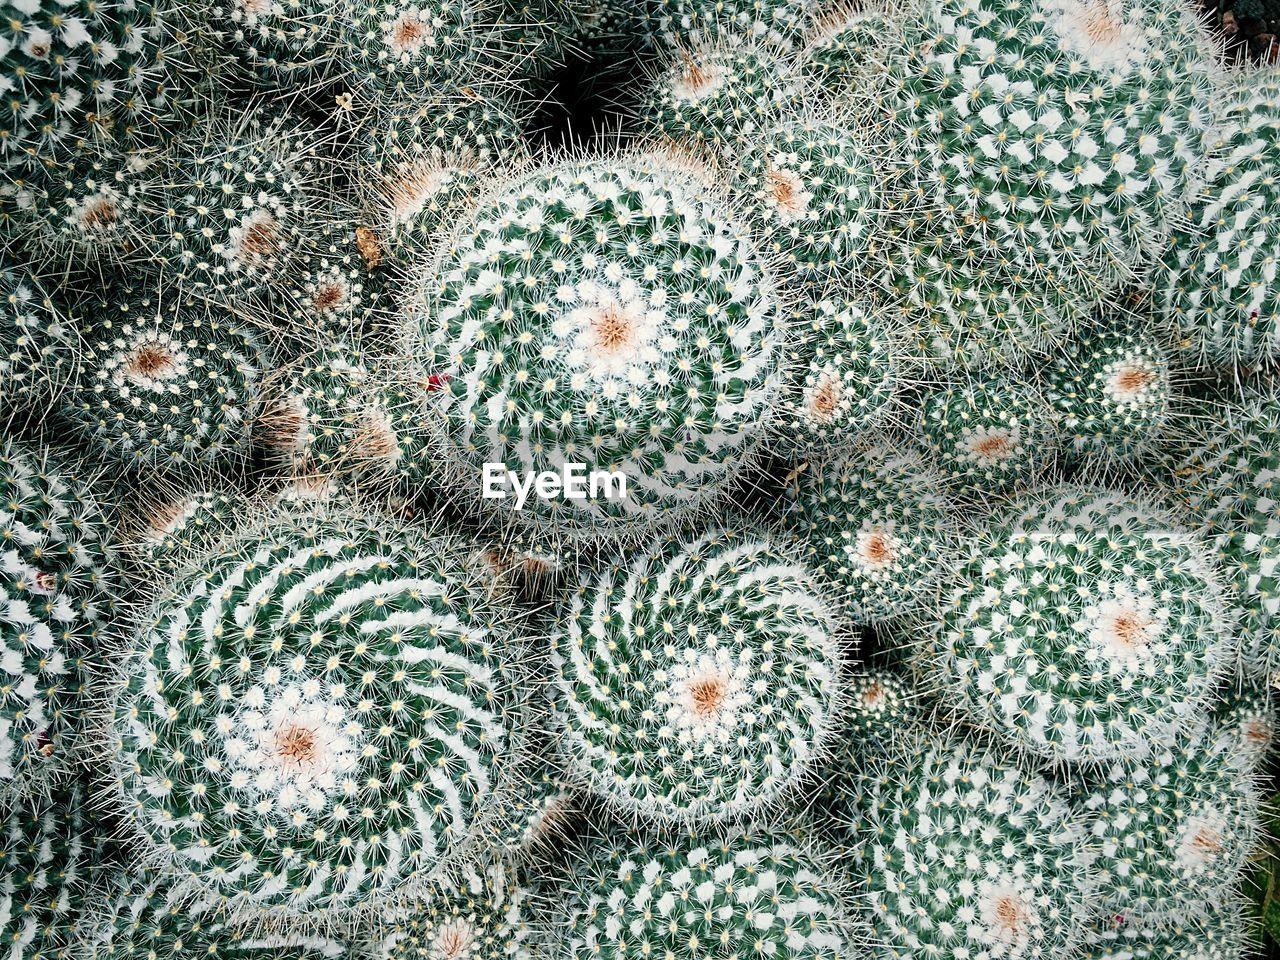 Full frame shot of barrel cactus growing outdoors